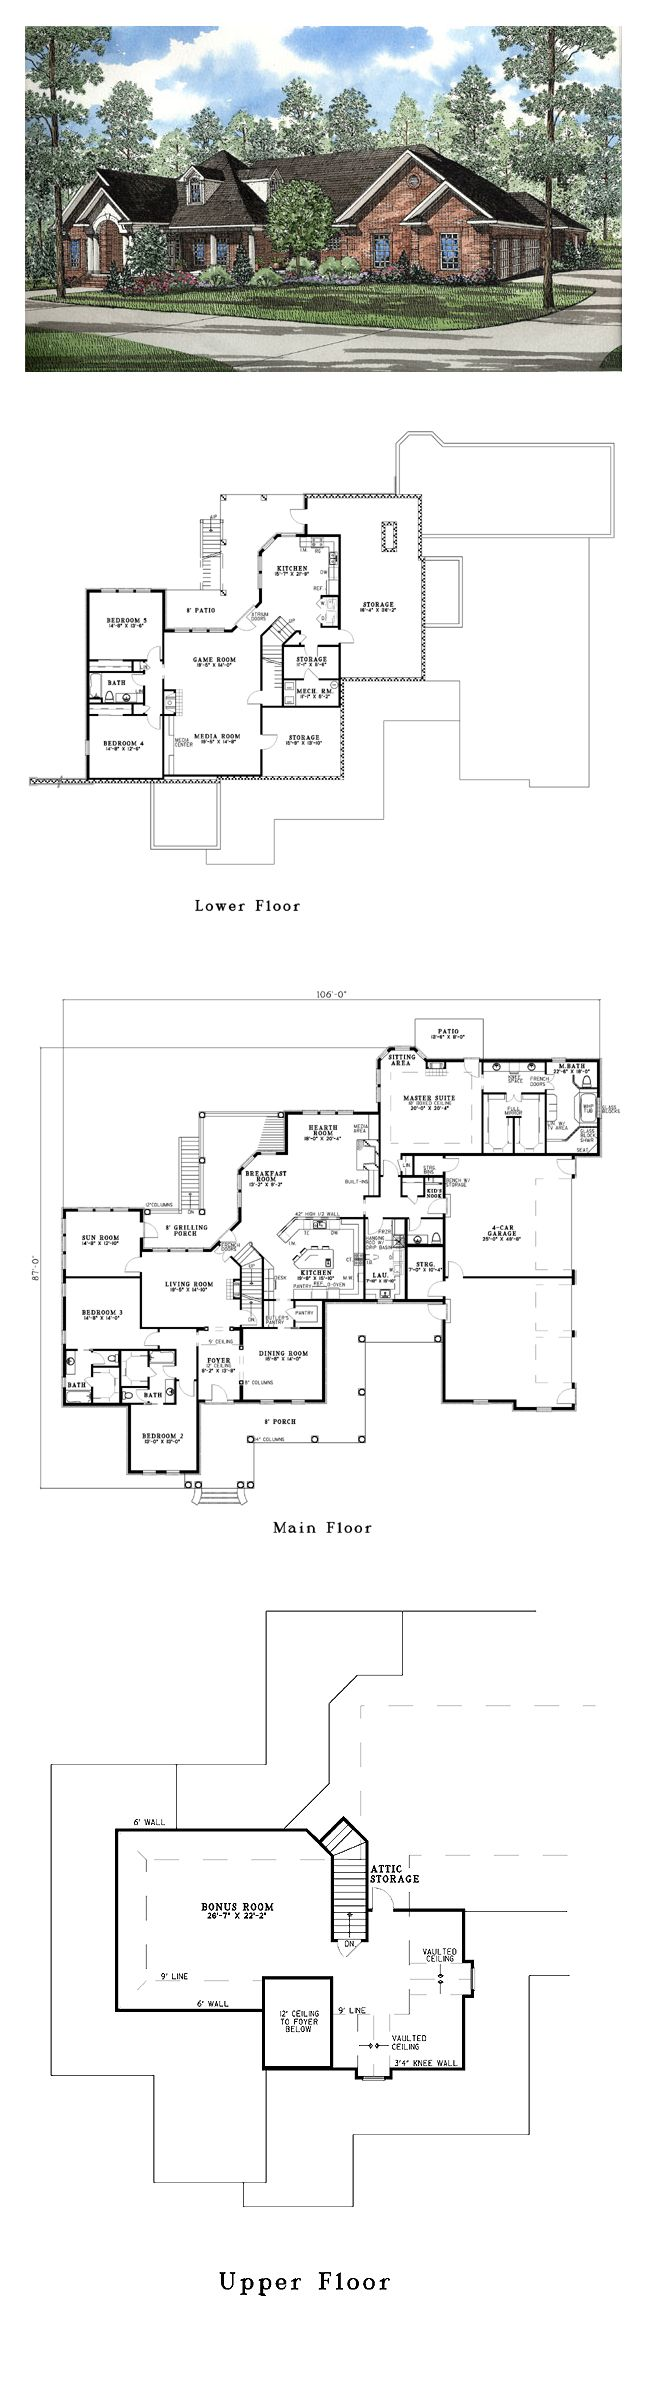 Cool House Plan Id Chp 32623